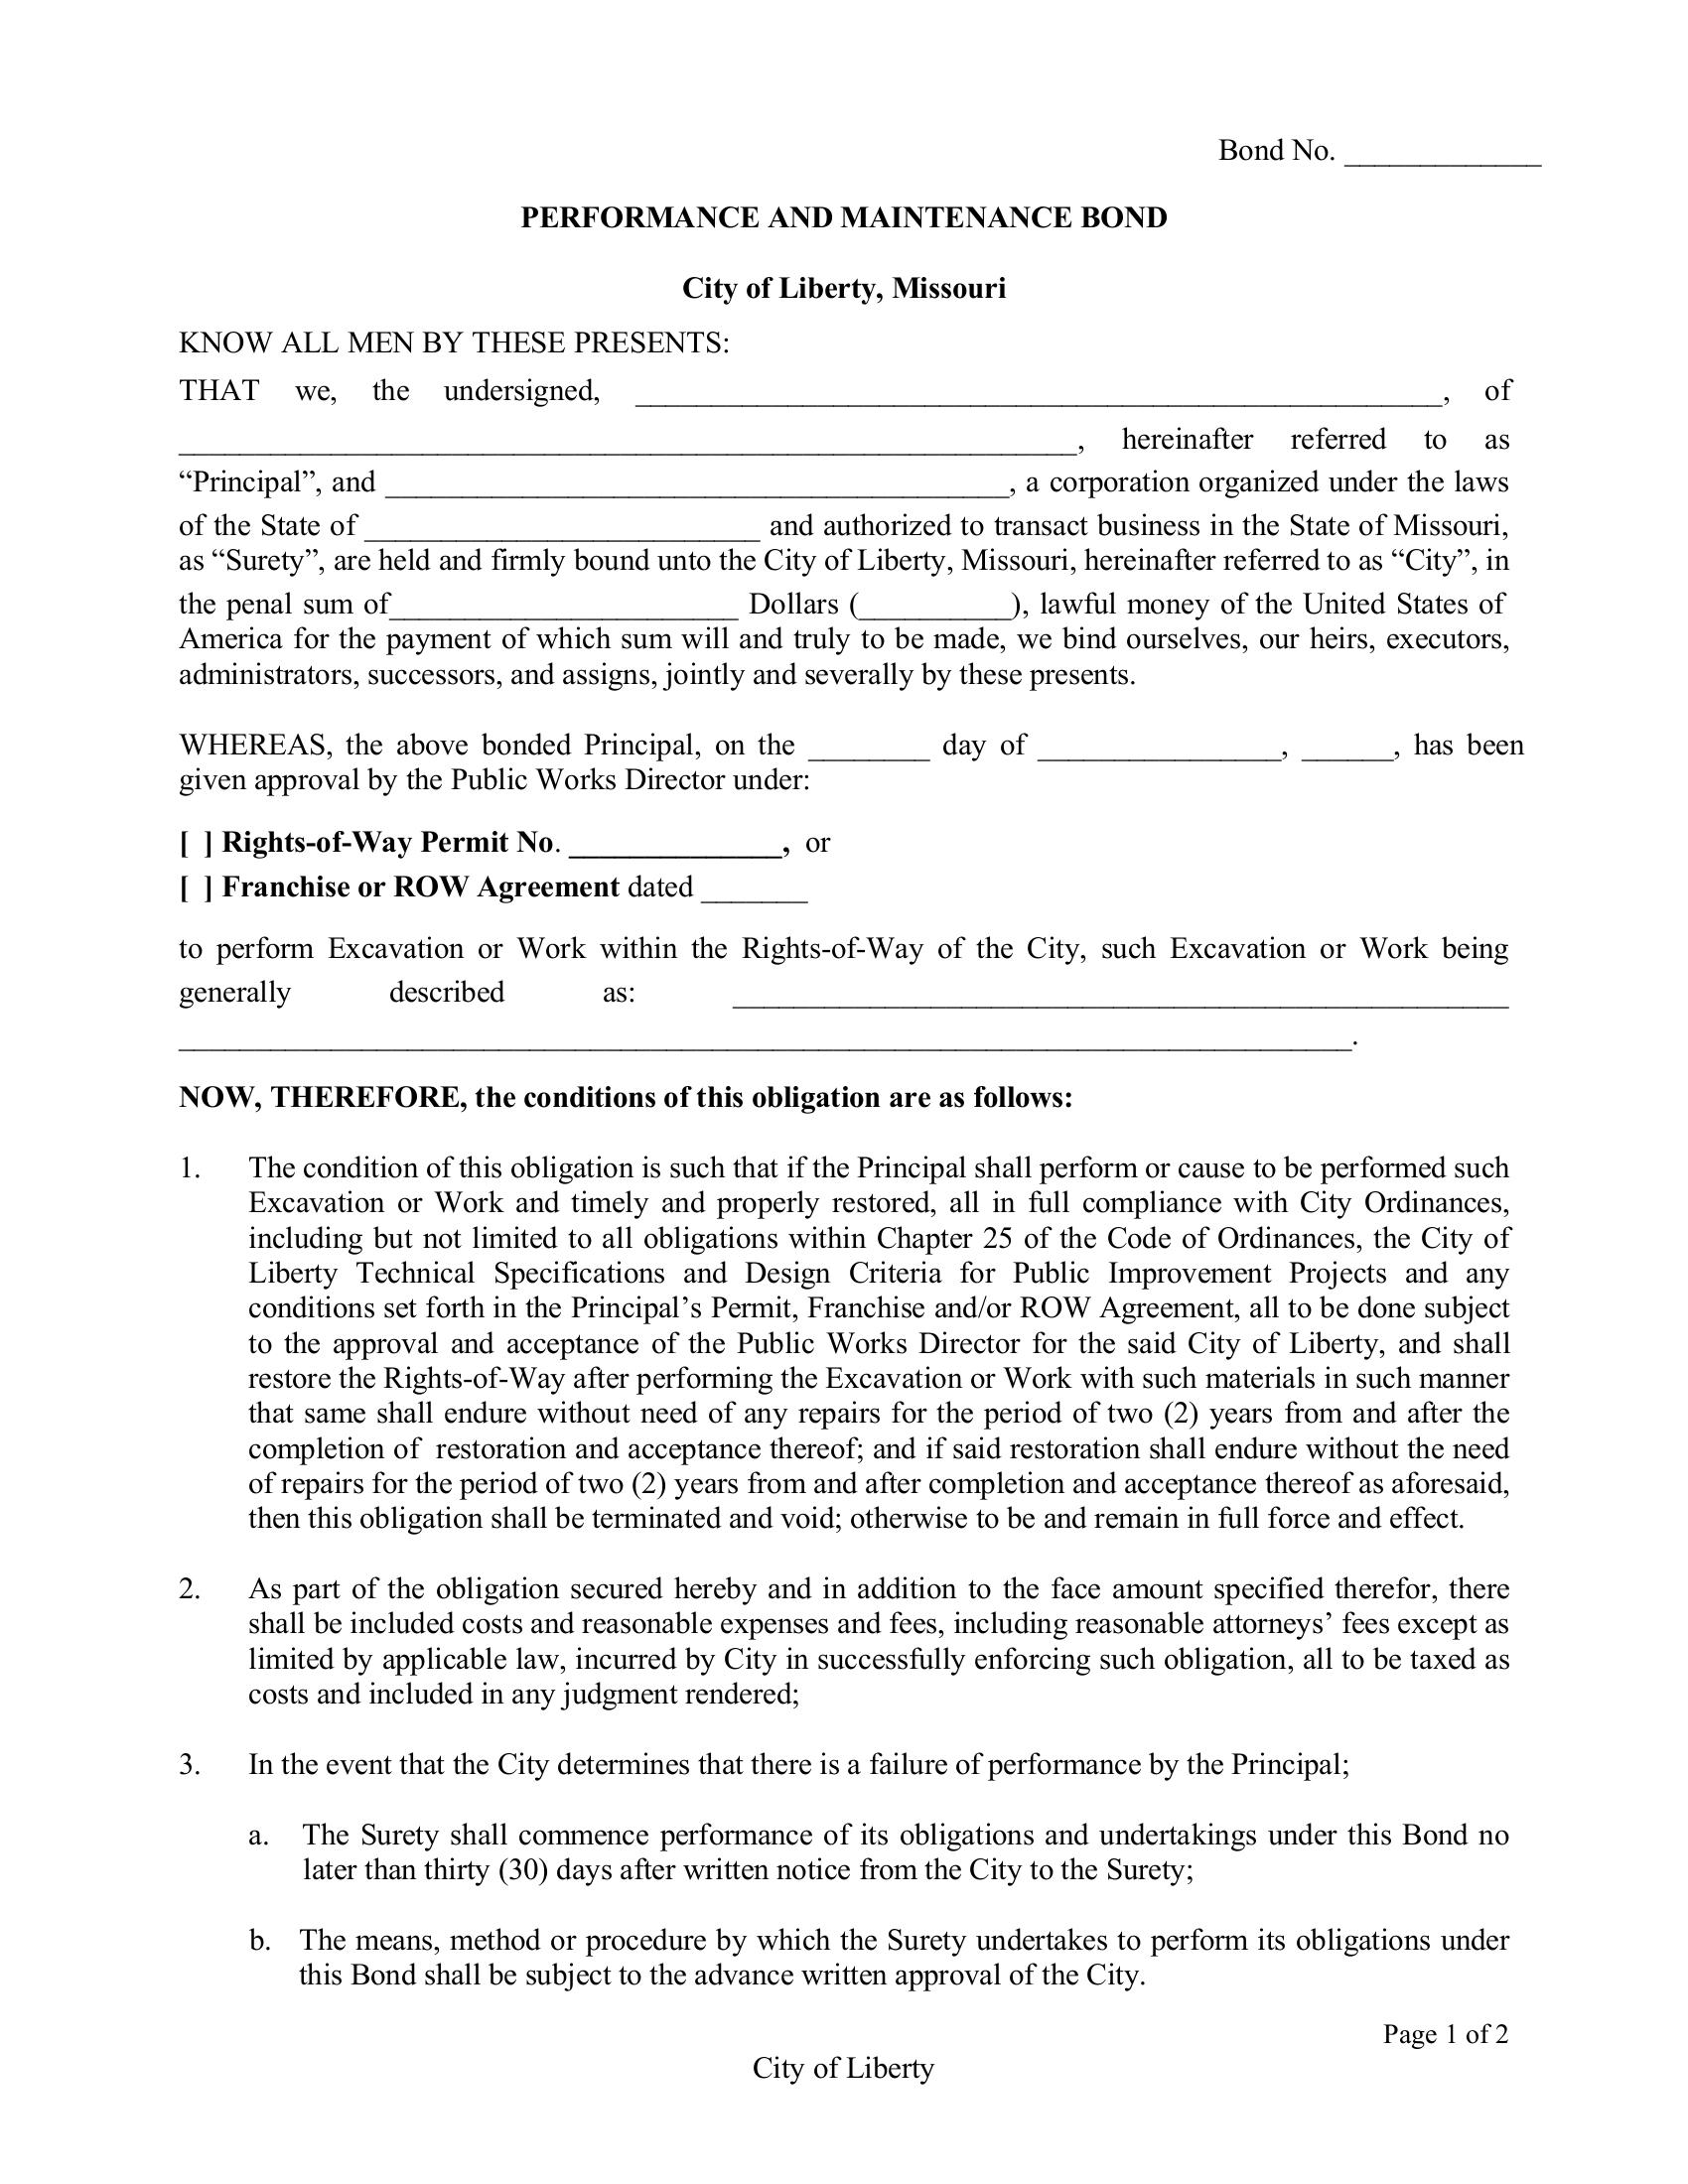 Liberty Right of Way Single Permit Bond sample image